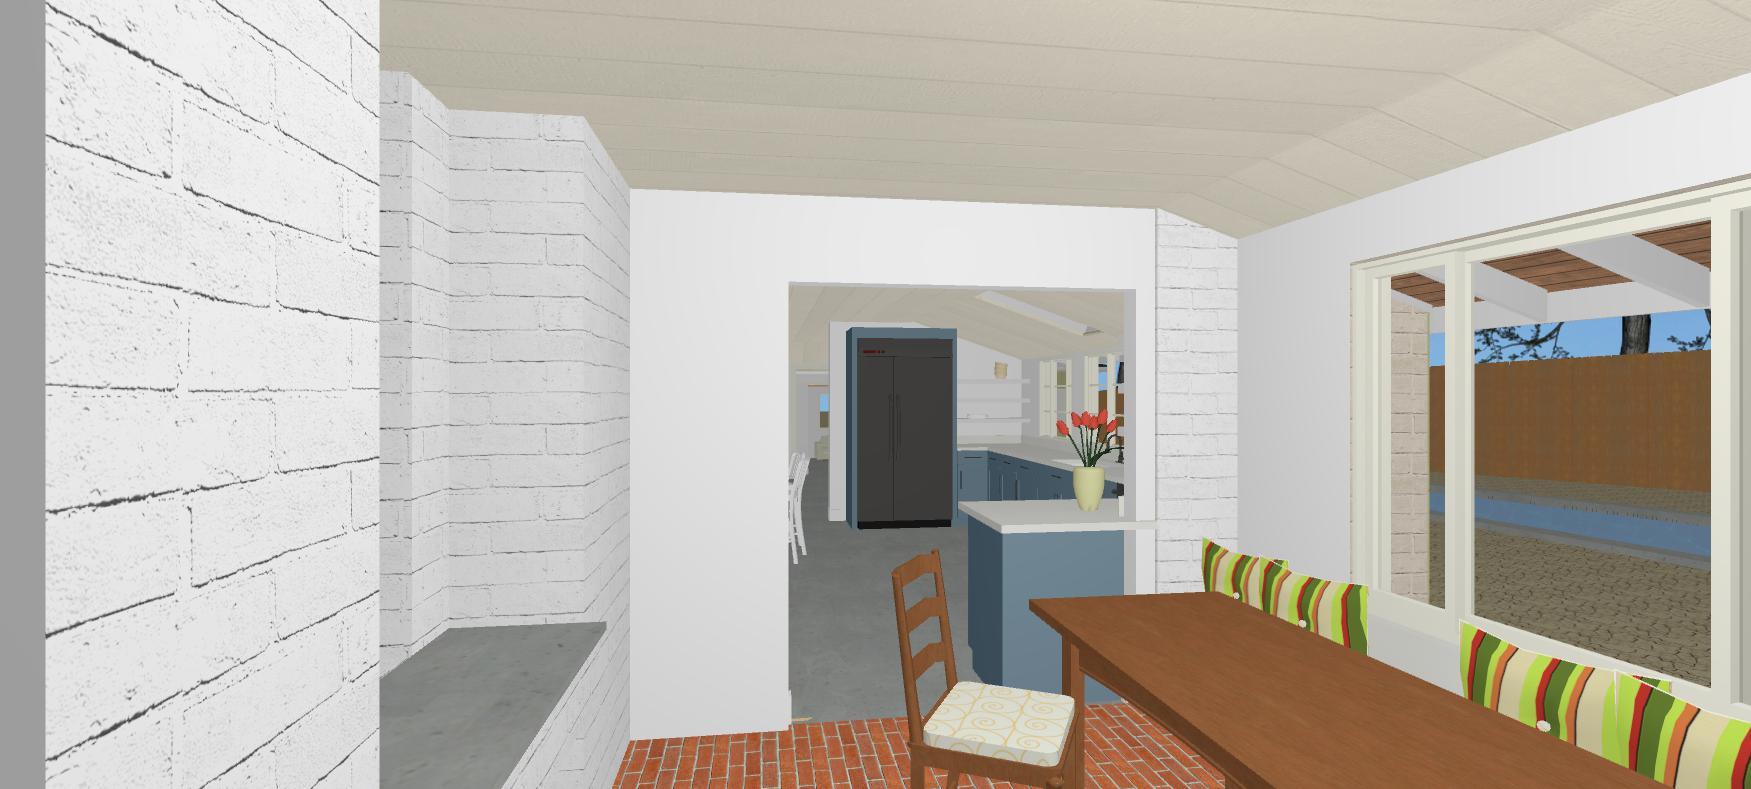 Ojai_remodel_Arbolada_kitchen2_2016_0131